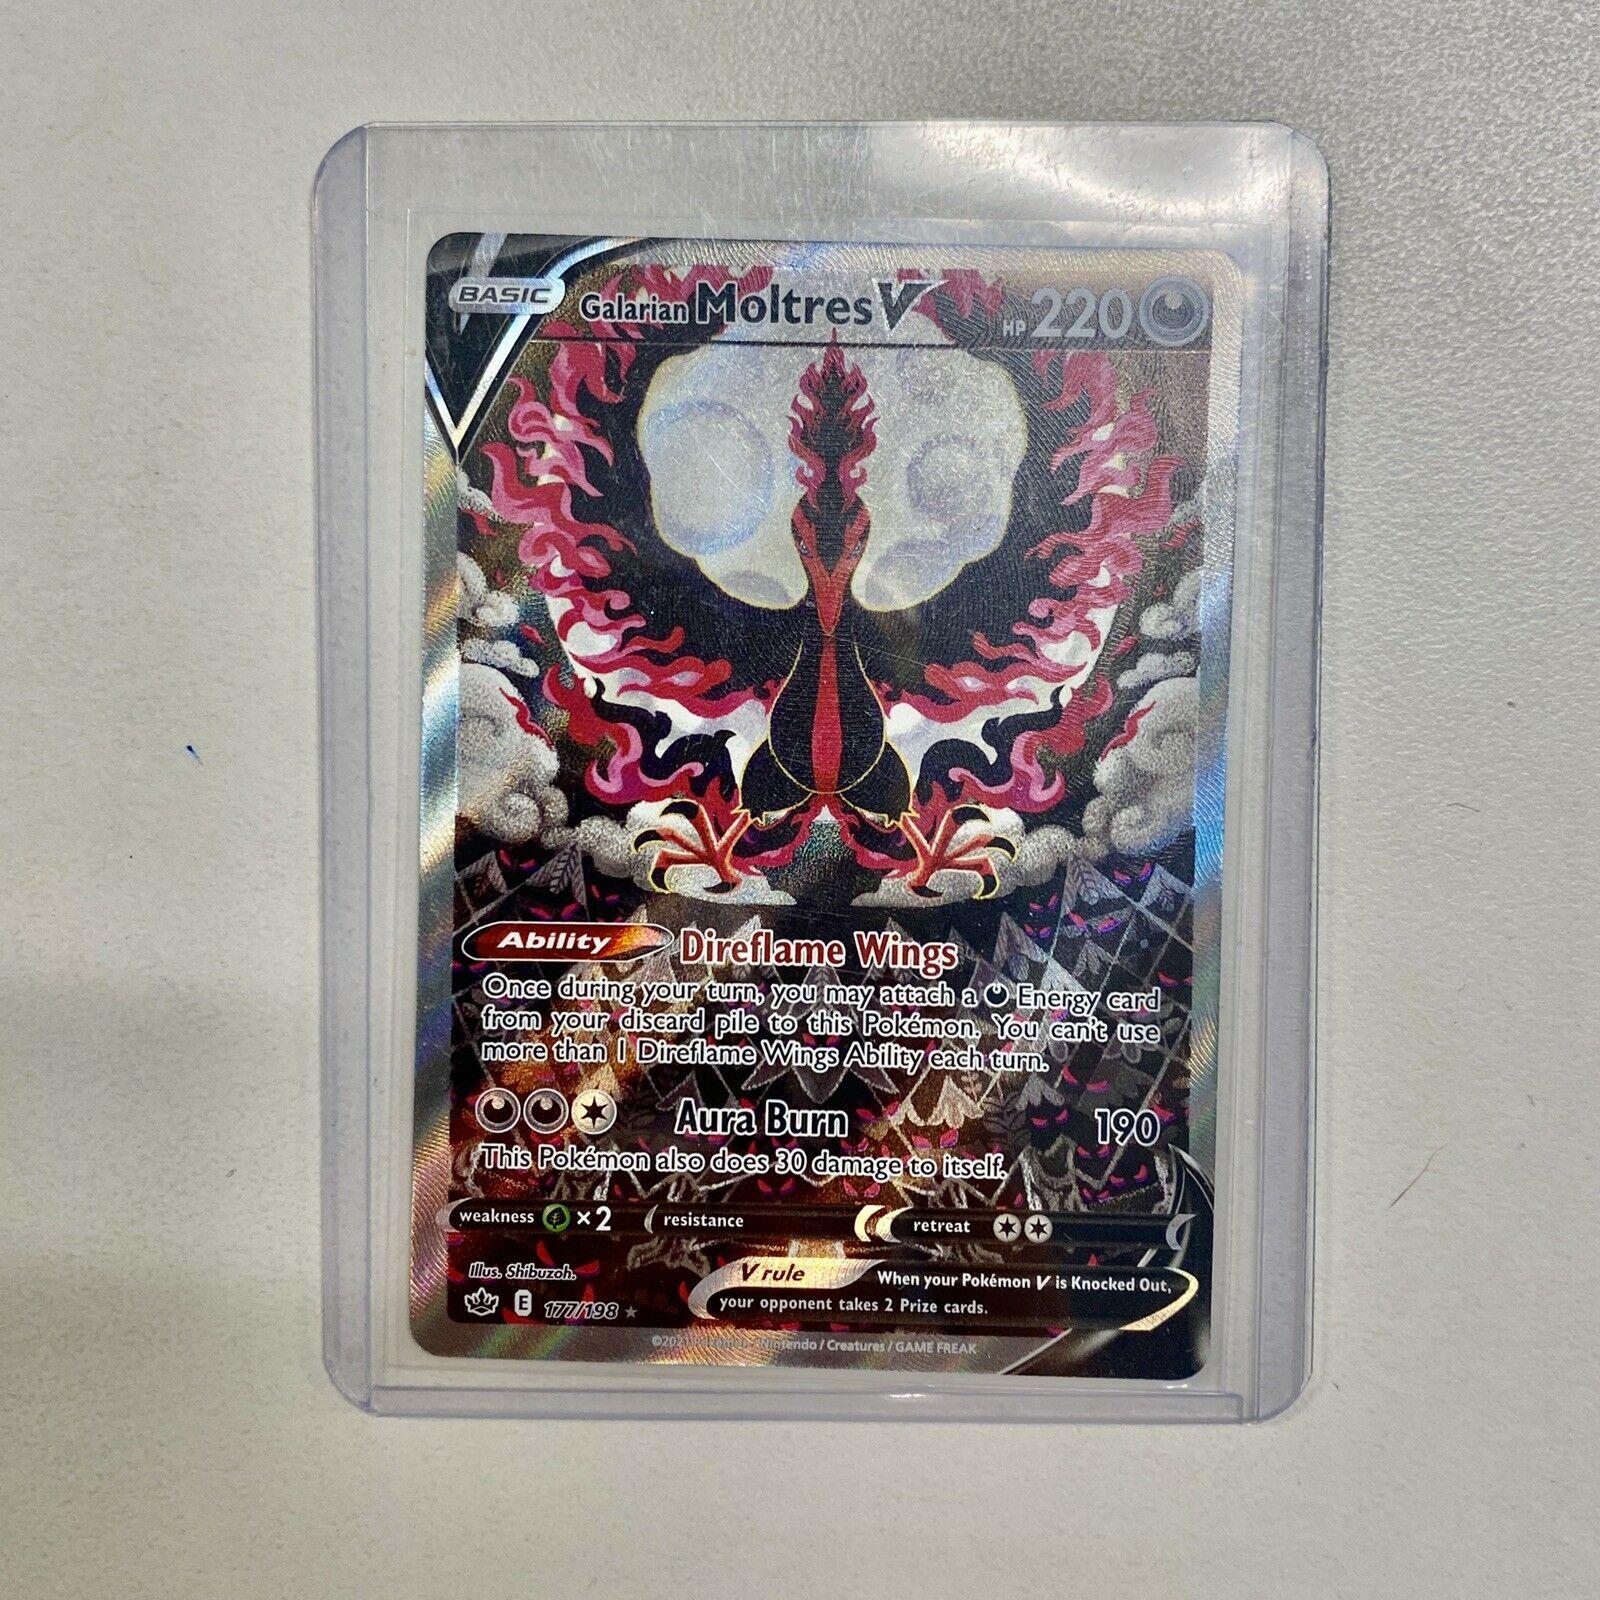 Pokemon TCG - Chilling Reign Galarian Moltres V Alternate Art Card - 177/198